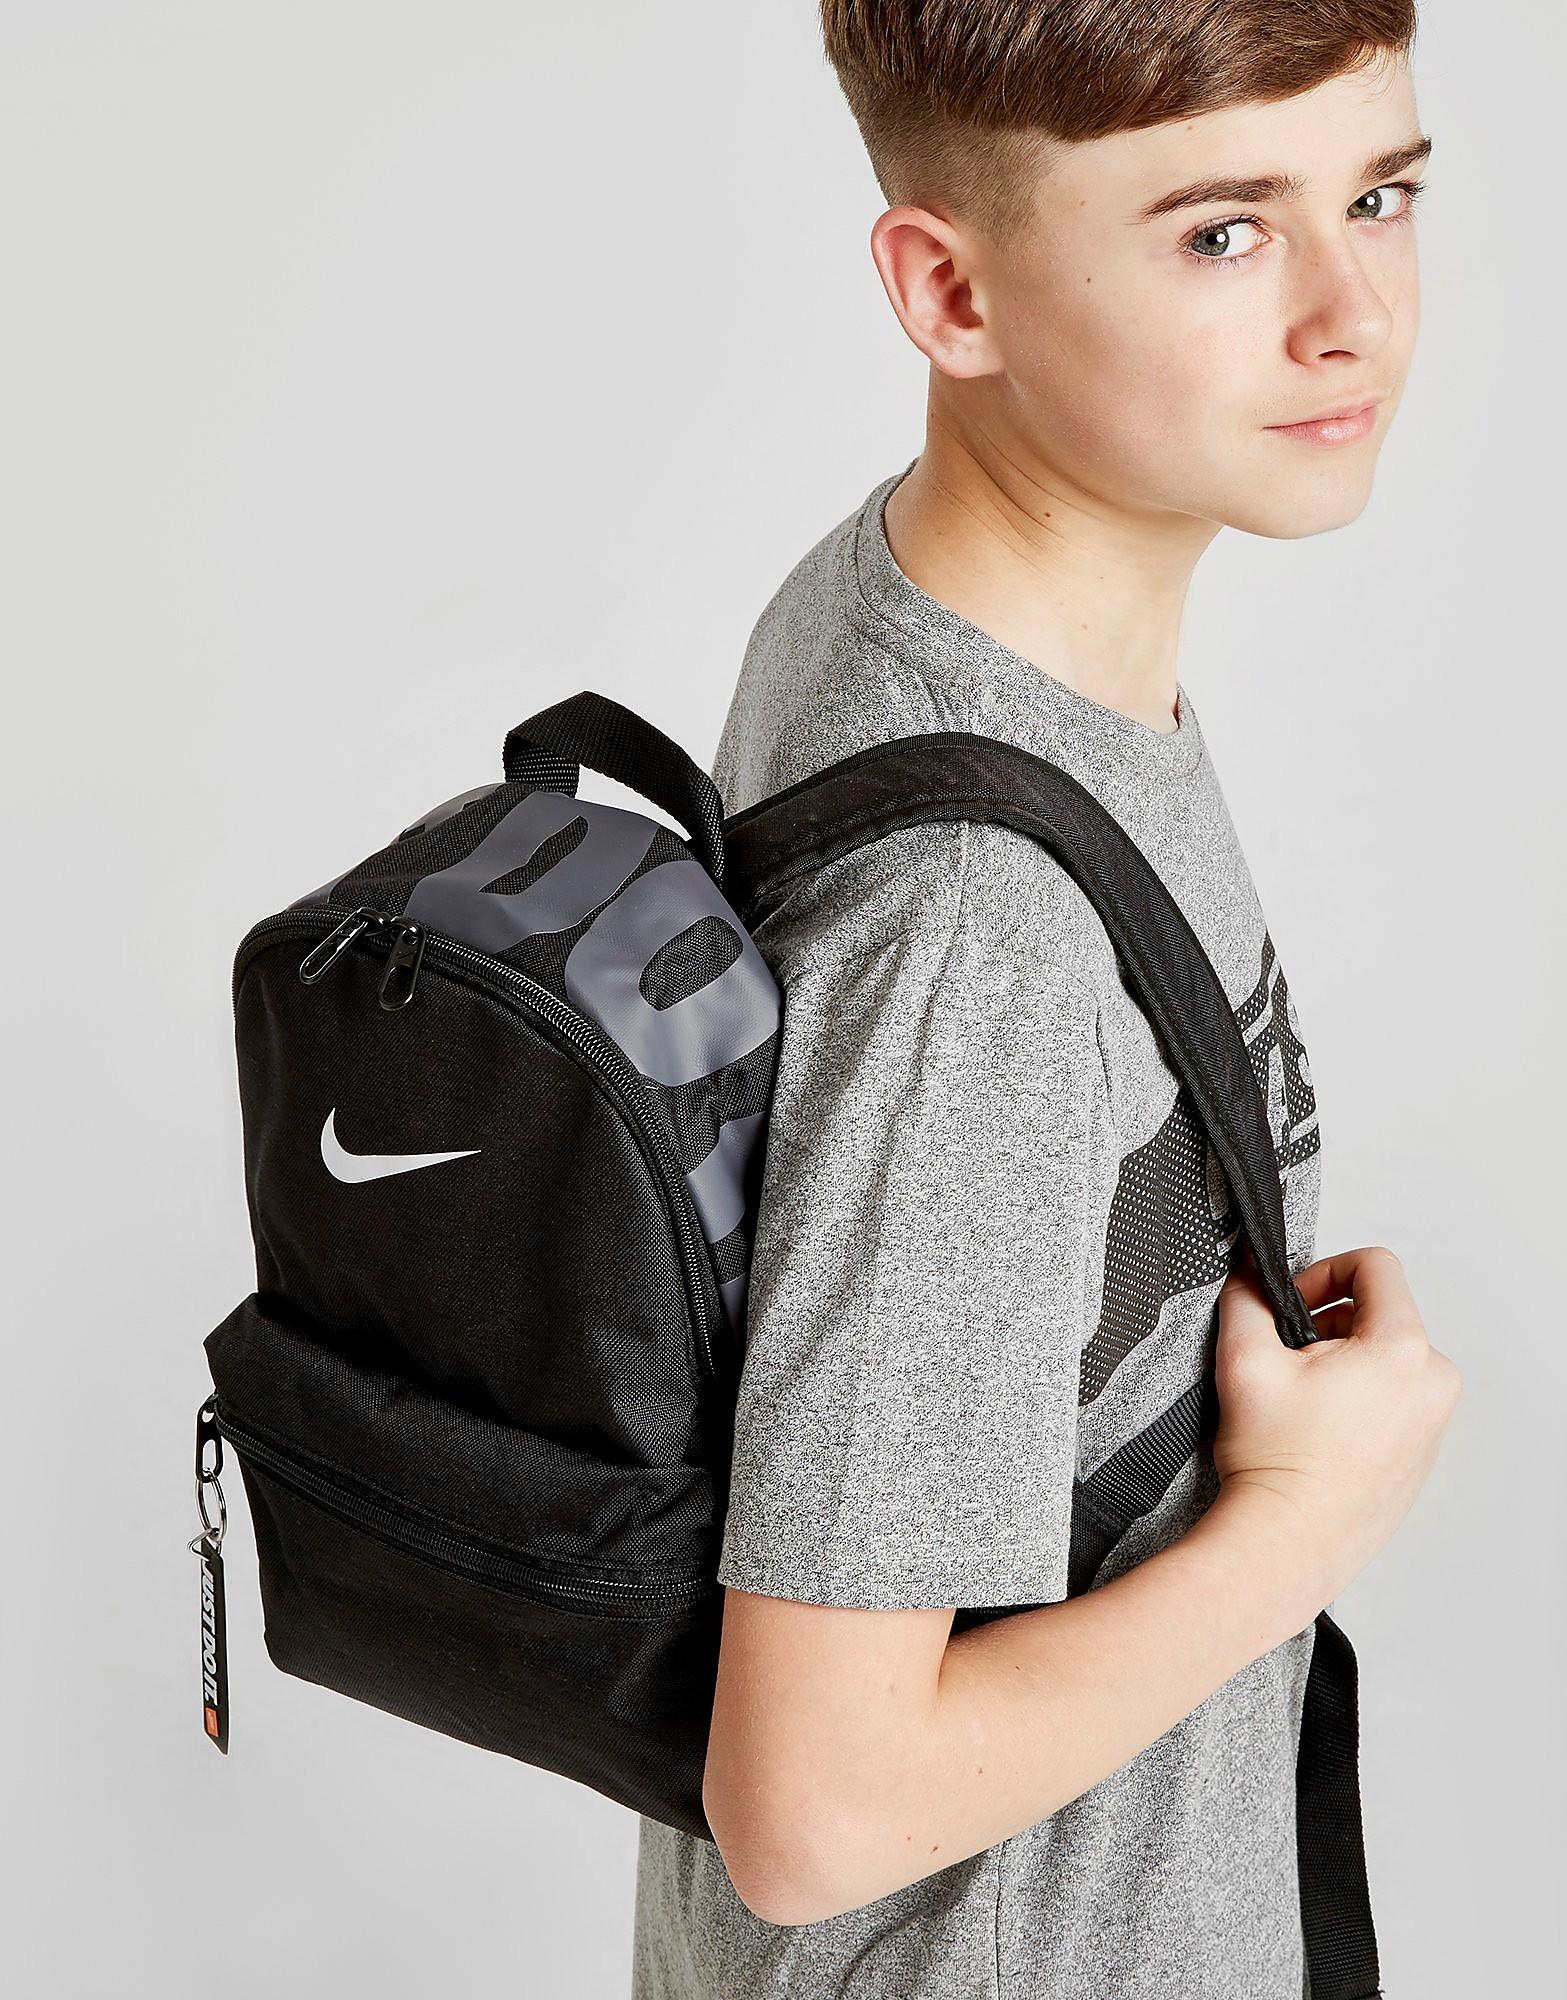 Nike Brasilia Just Do It Kids Mini Backpack